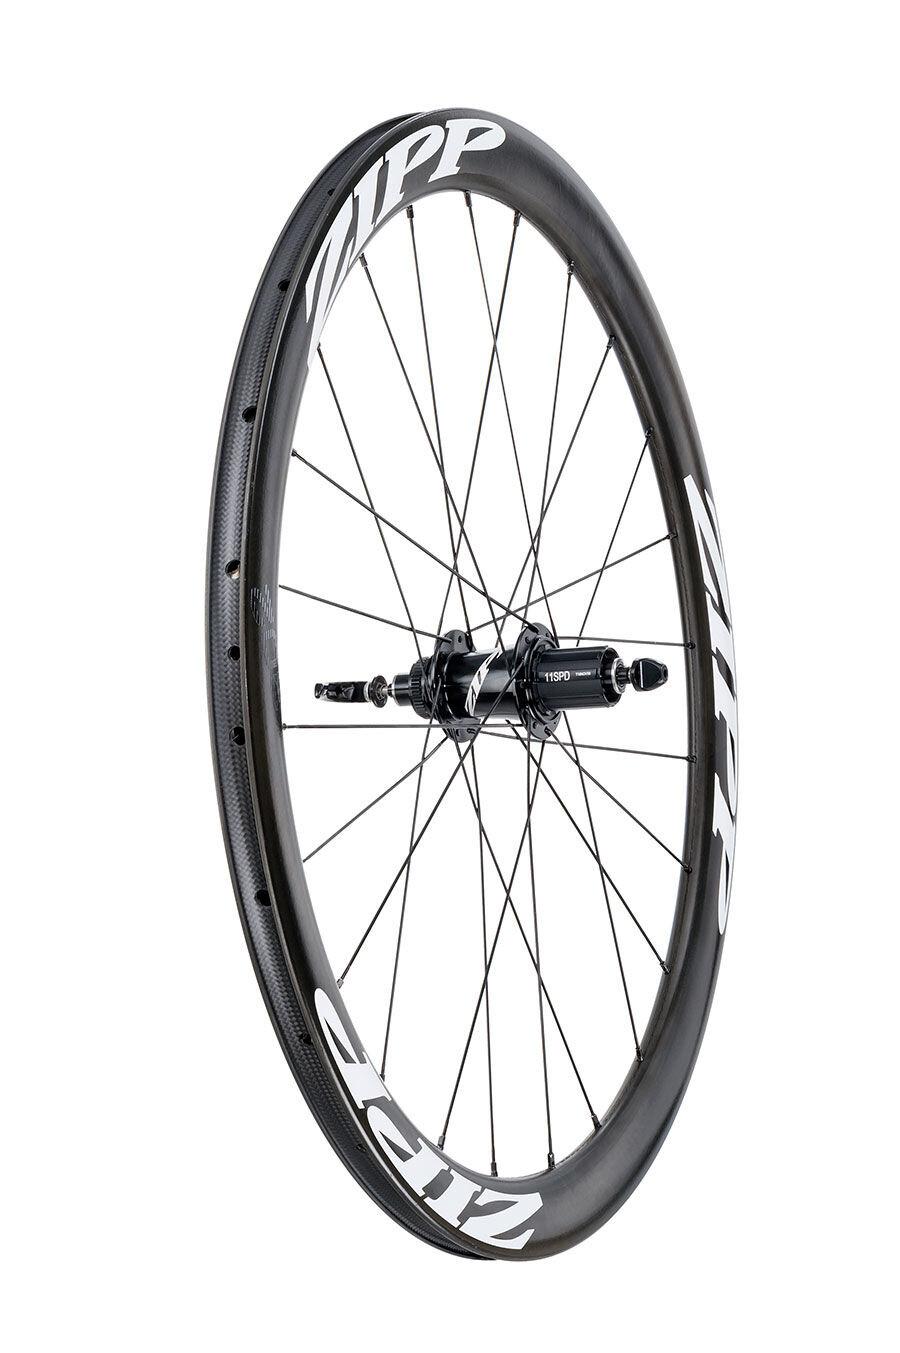 Zipp 302 Disc Carbon Baghjul Clincher Centerlock SRAM/Shimano, black (2019) | Rear wheel